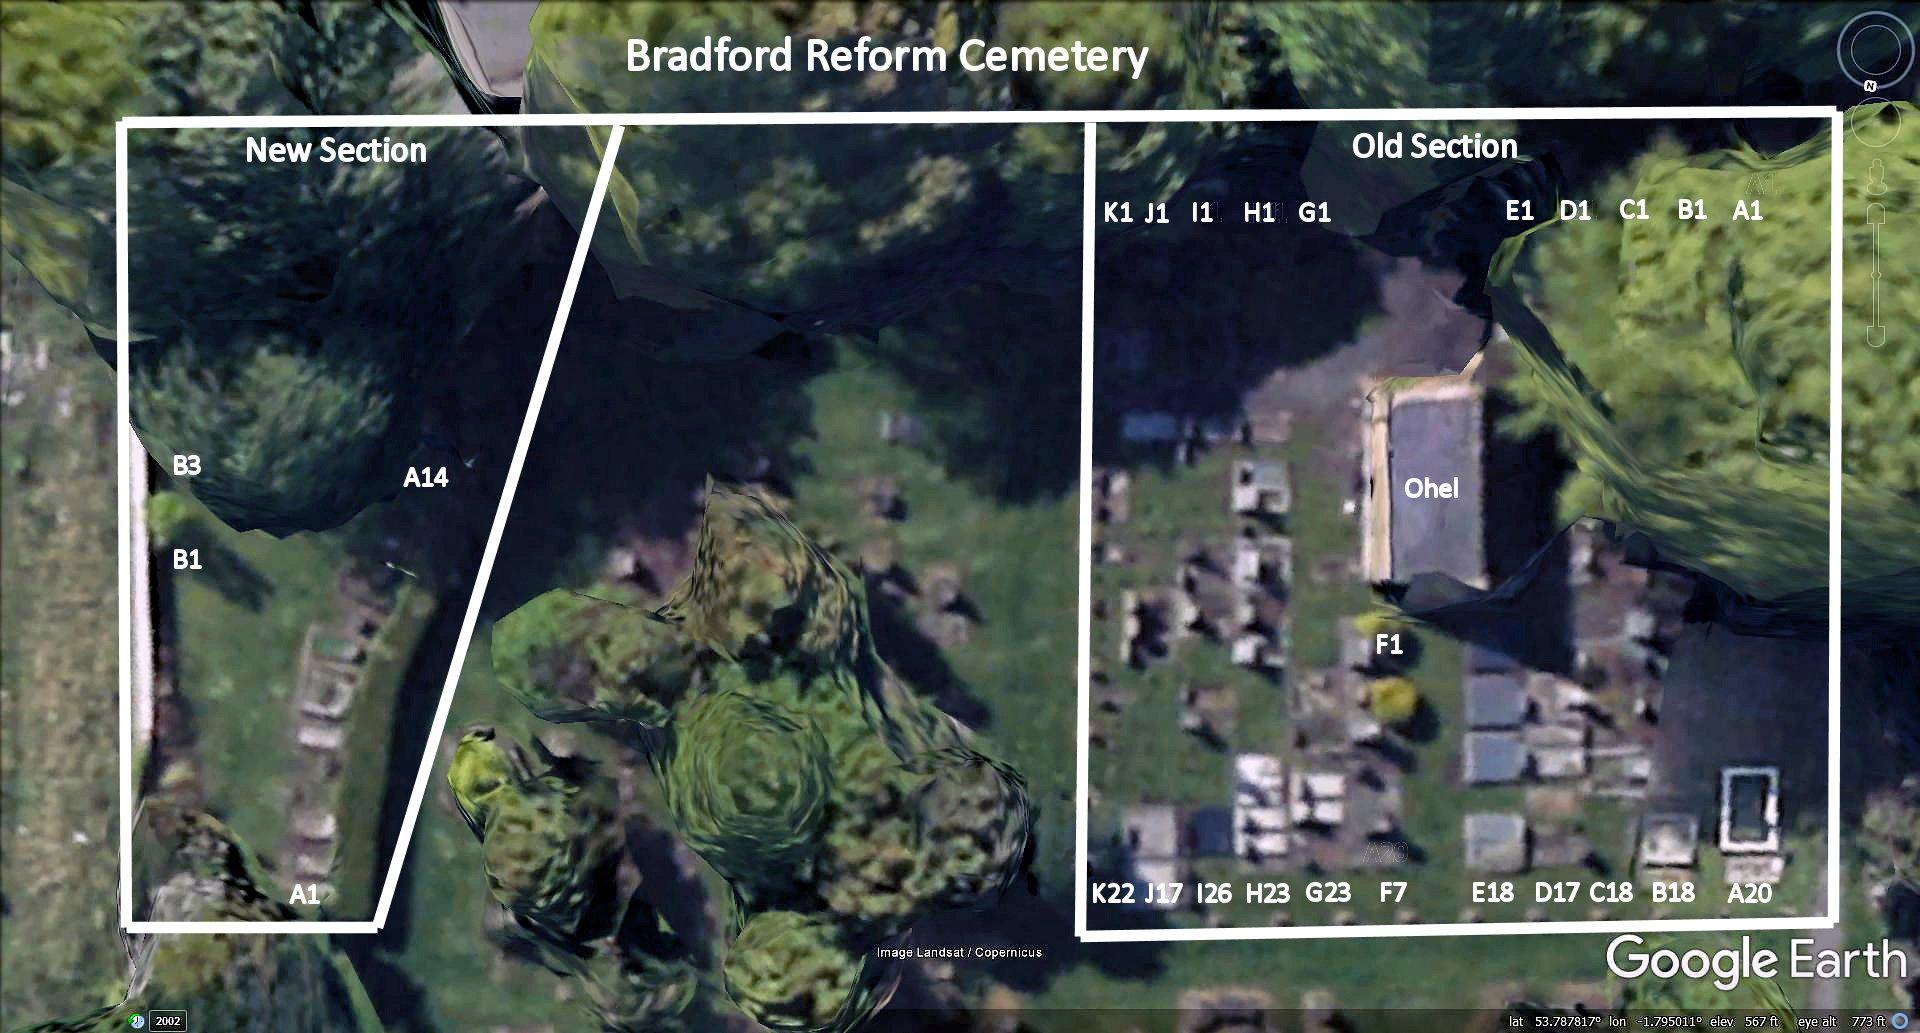 Bradford Cemetery Project Bradford Cemeteries